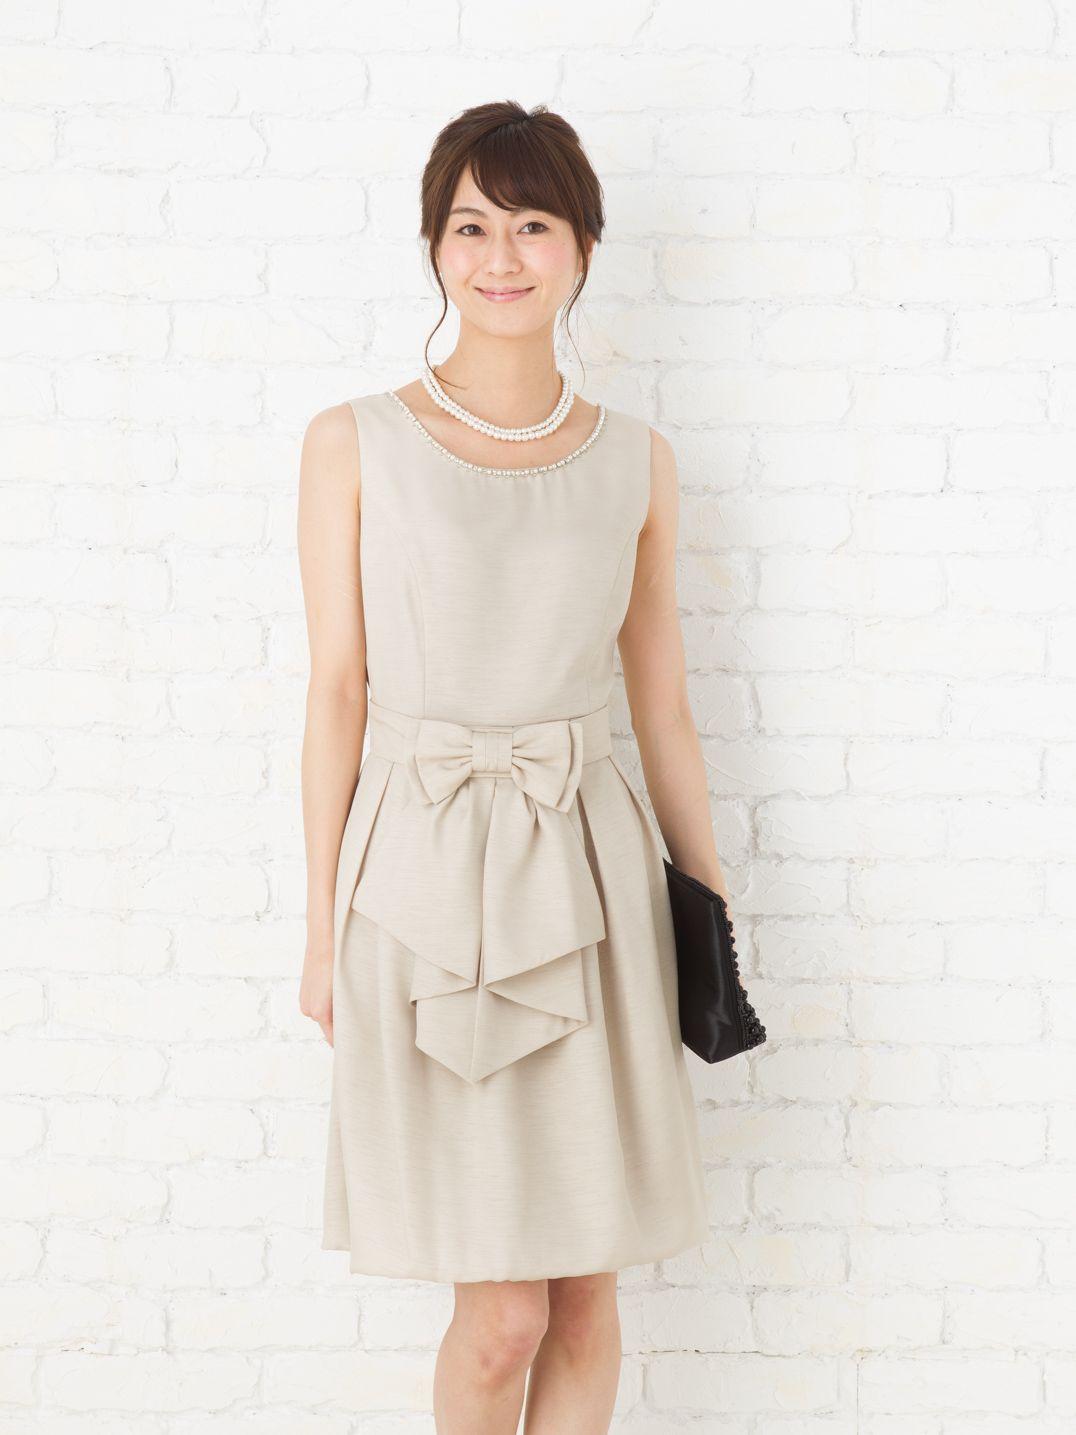 RYK ドレス / Mサイズ (DOC0052)